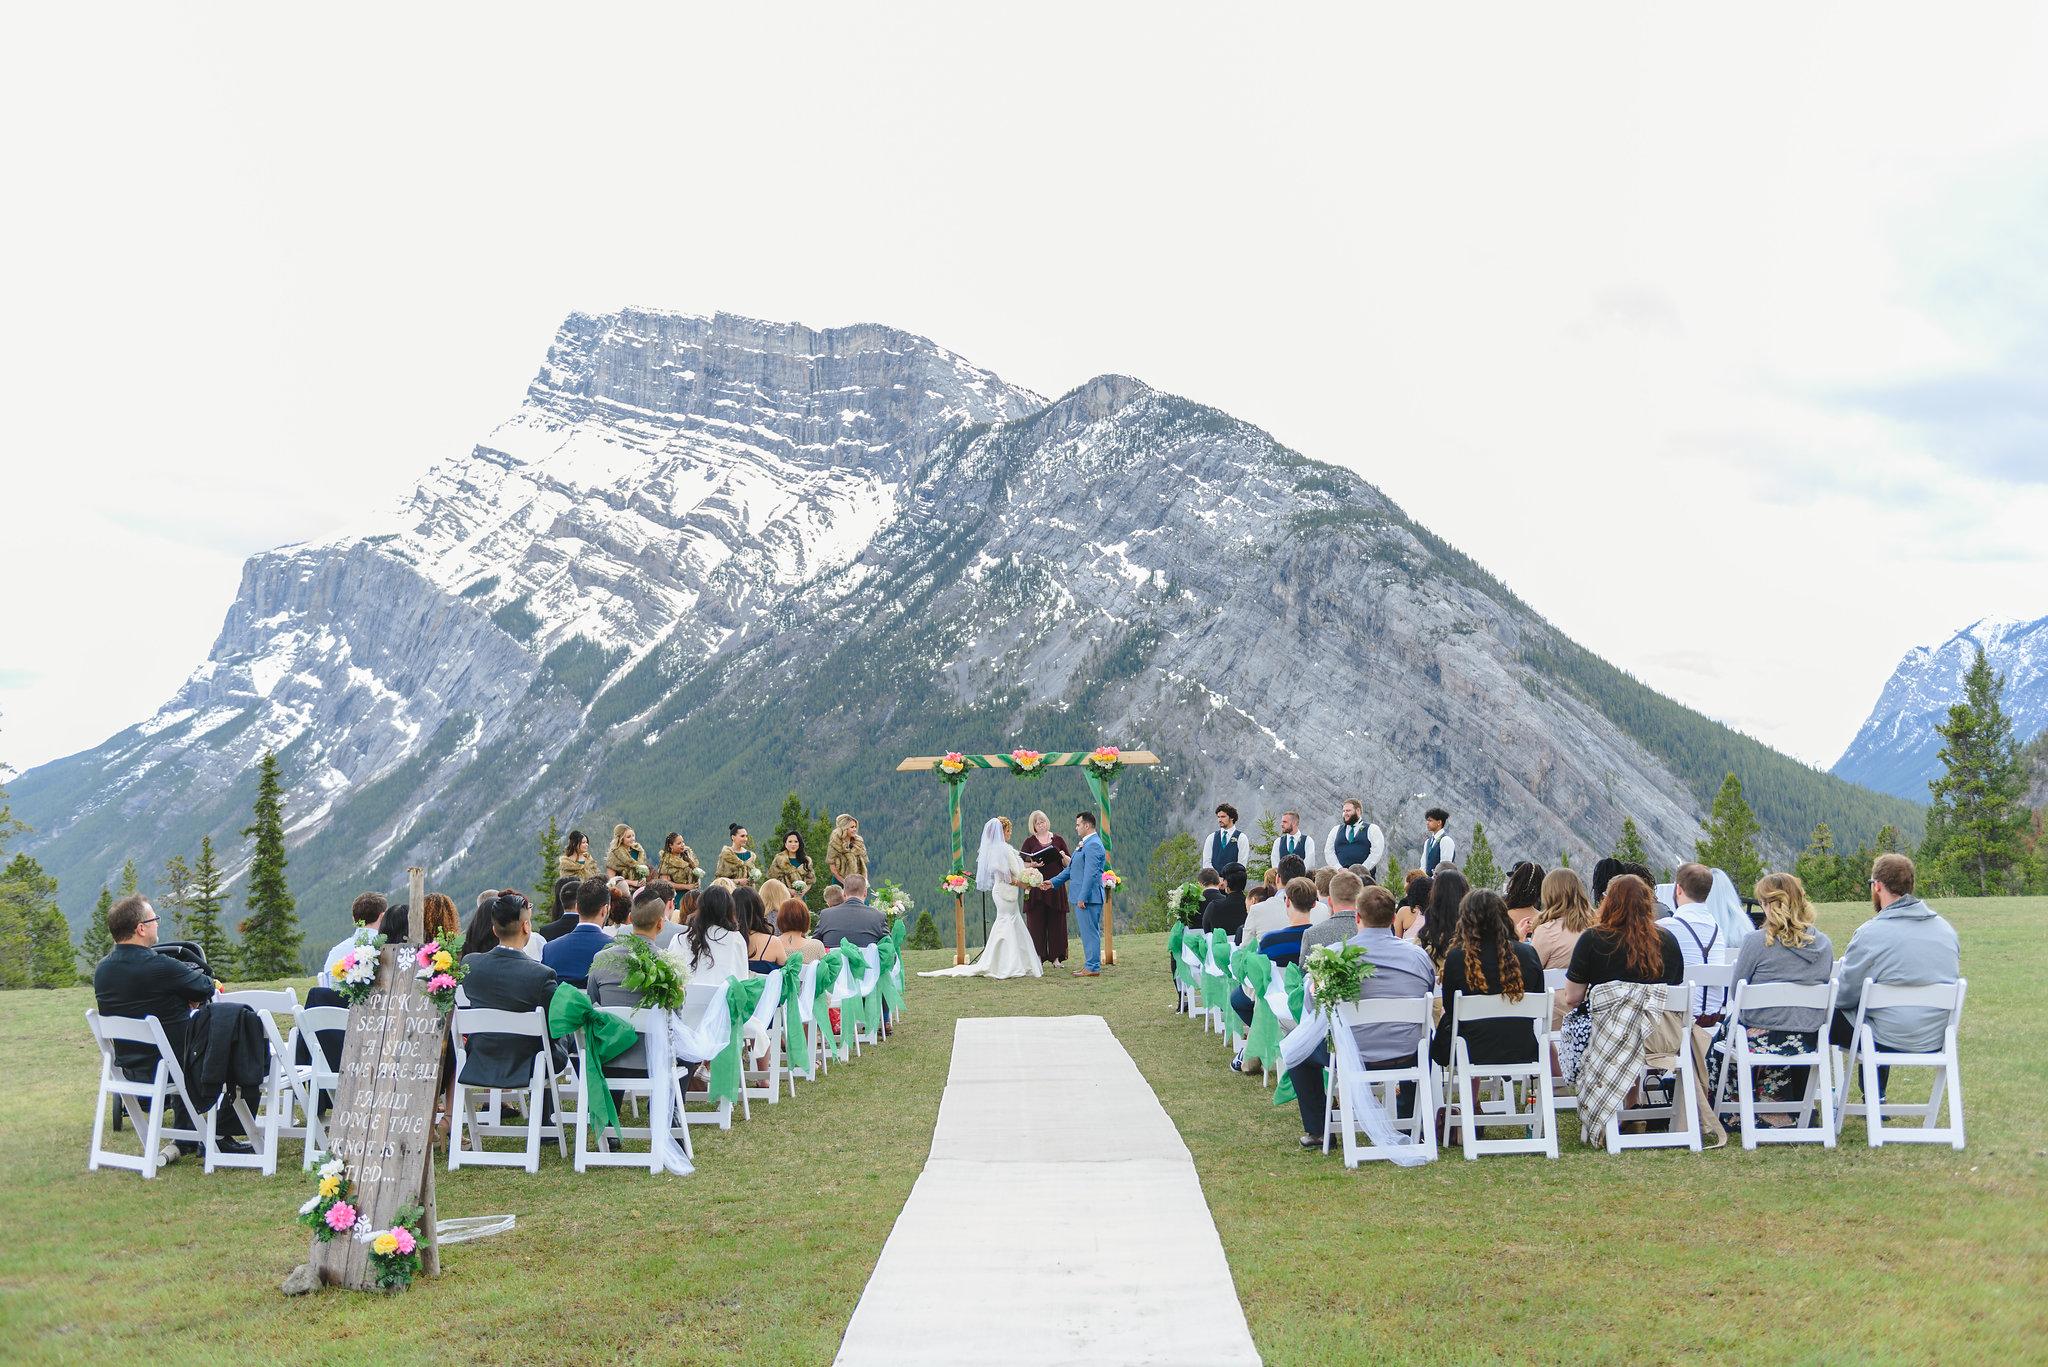 Banff-Tunnel-Mountain-Wedding